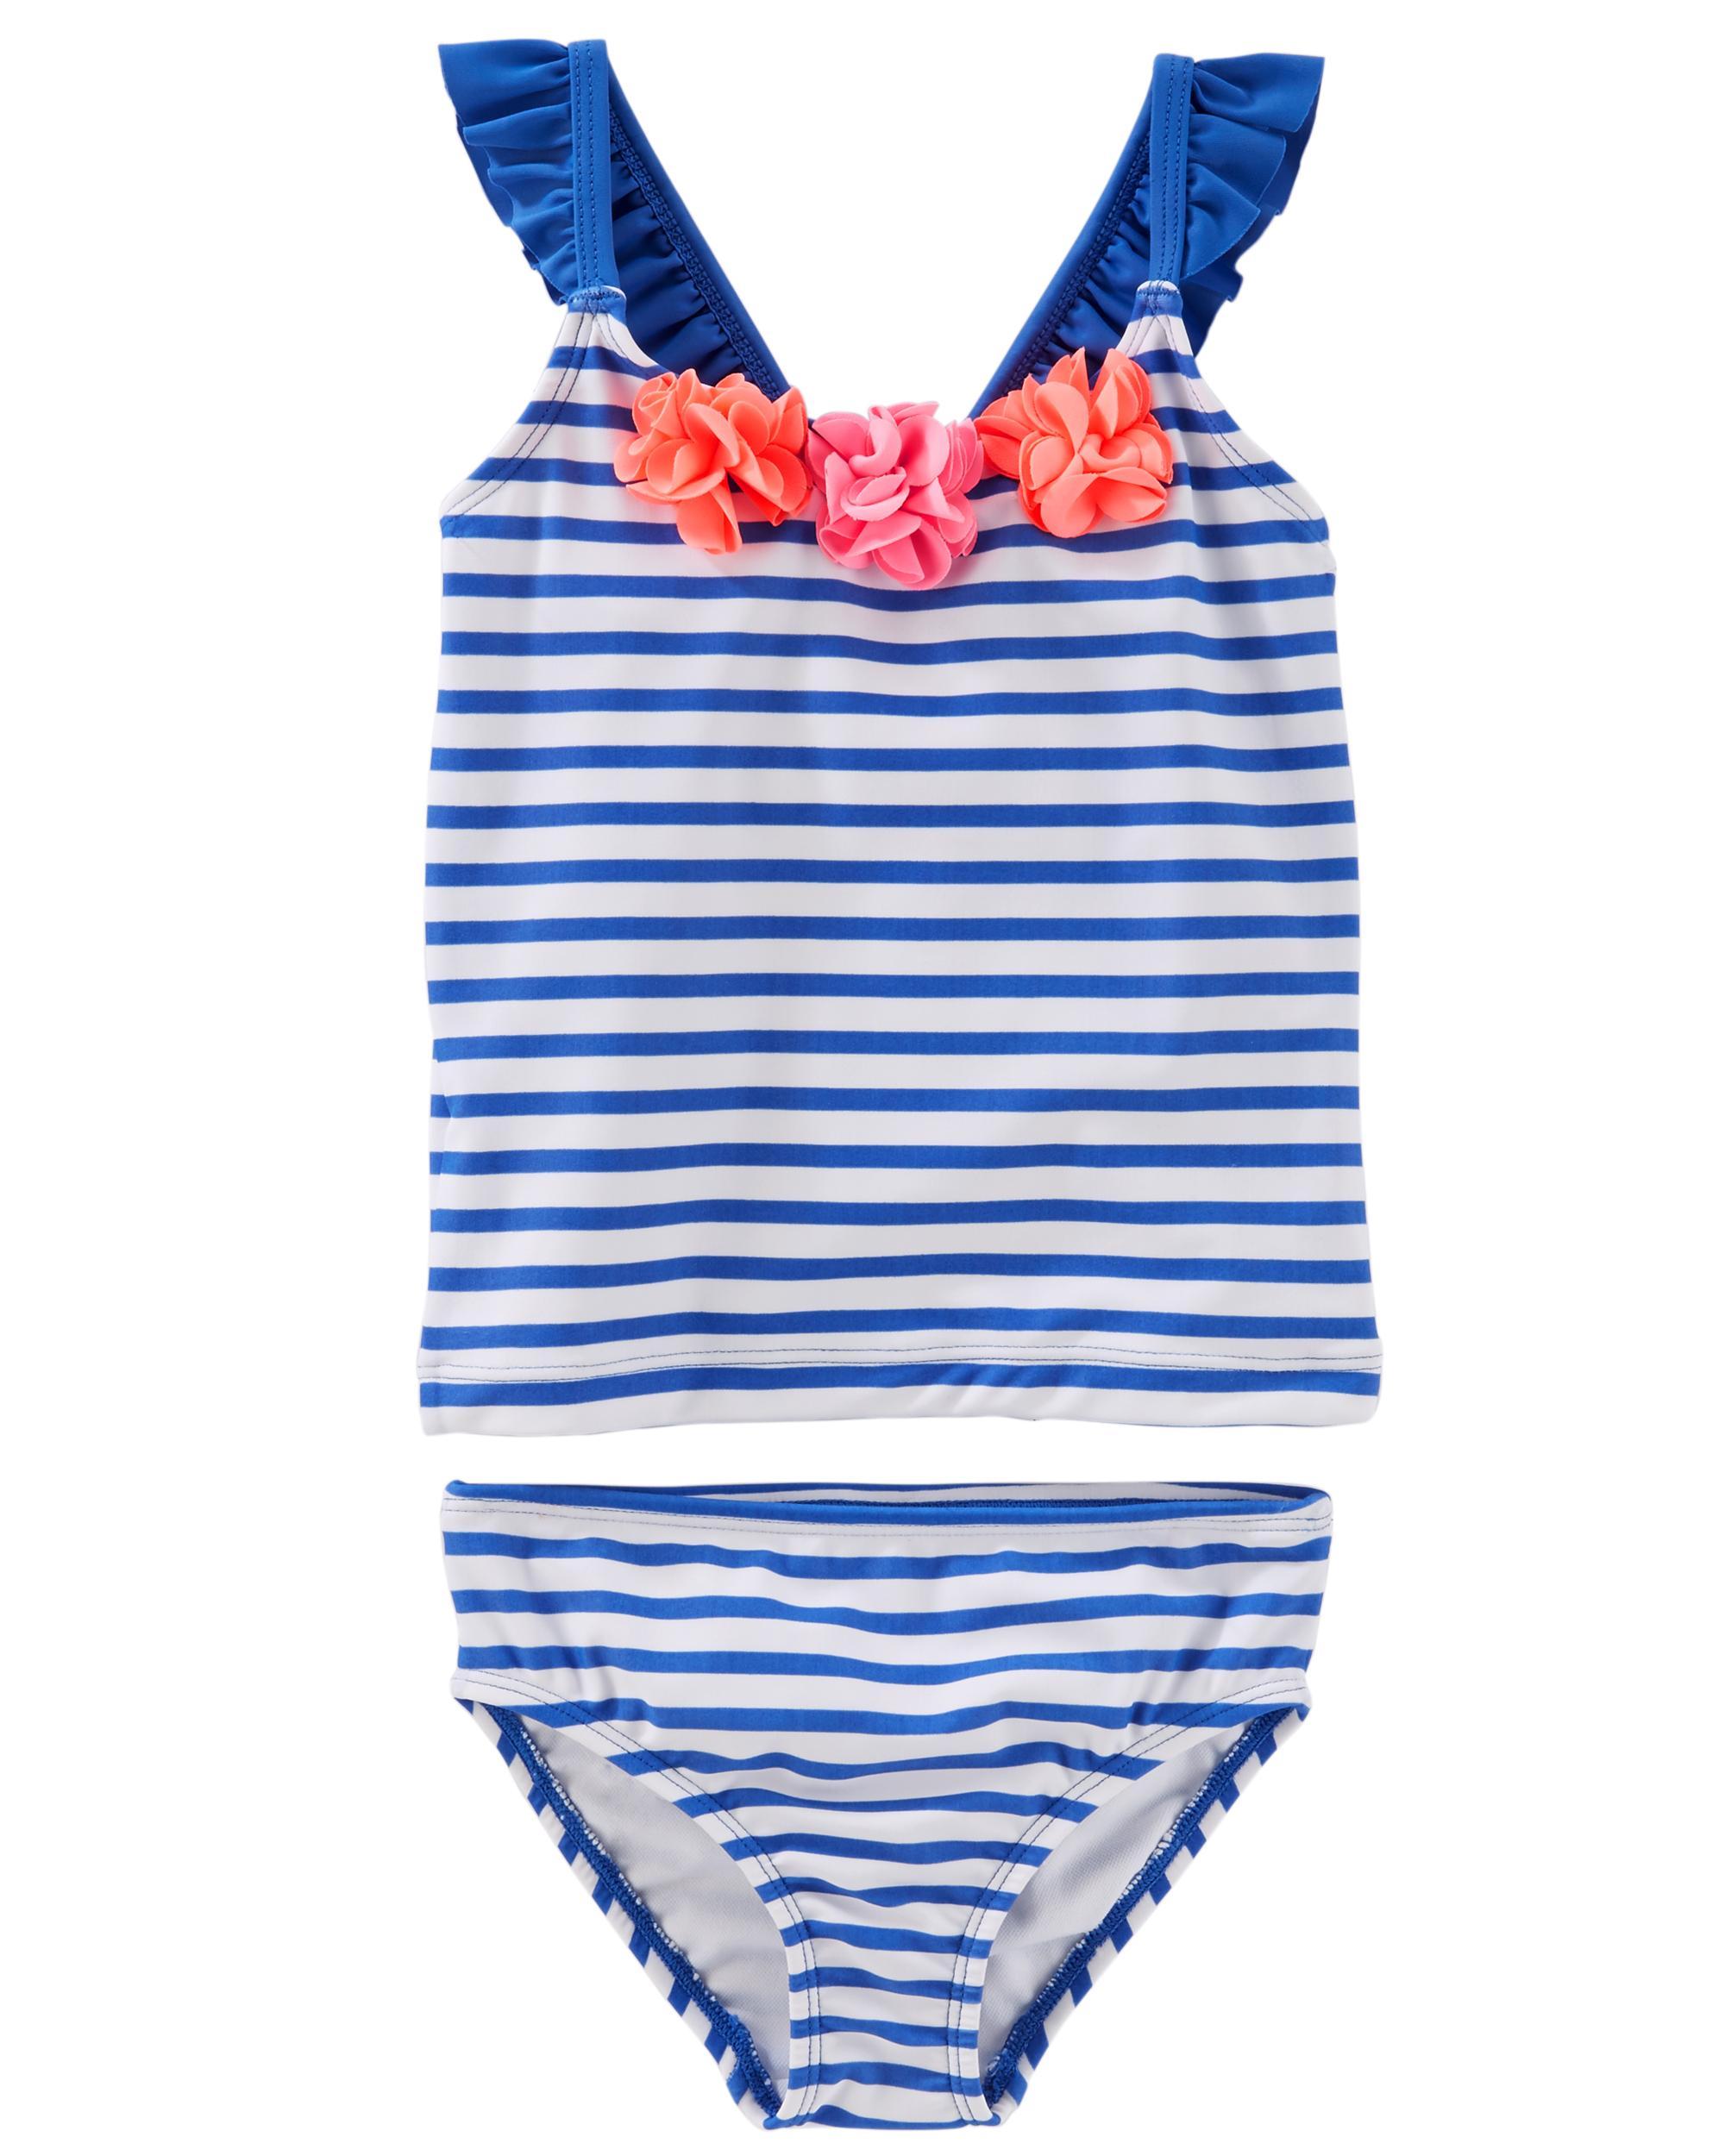 Toddler Girl Clothes Oshkosh